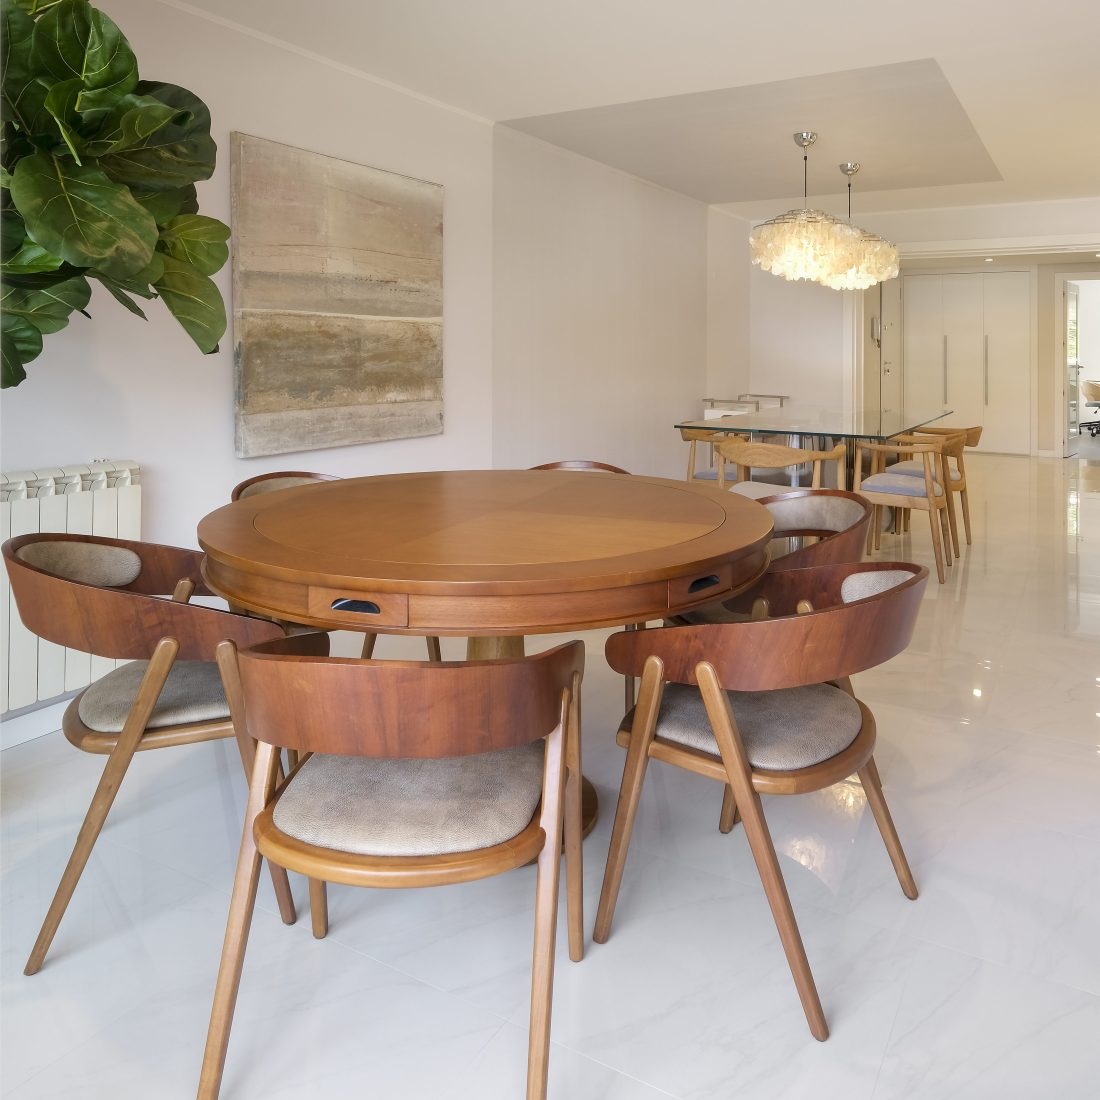 VBS Interior Design - Lounge